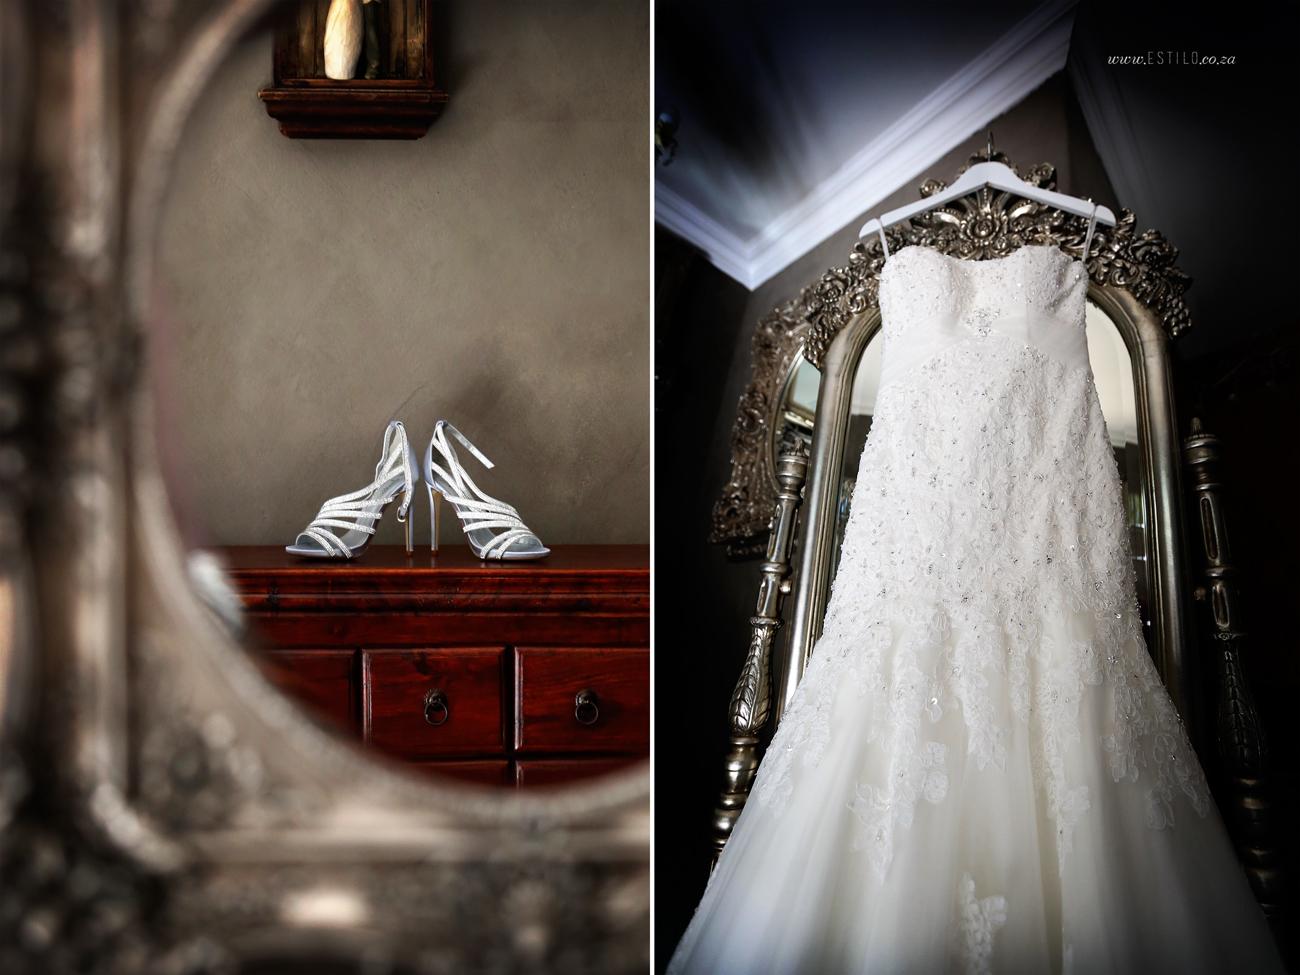 memoire-wedding-photograpgers-weddings-at-memoire-muldersdrift-best-wedding-photographers-gauteng-best-wedding-photographers-south-africa_0003.jpg